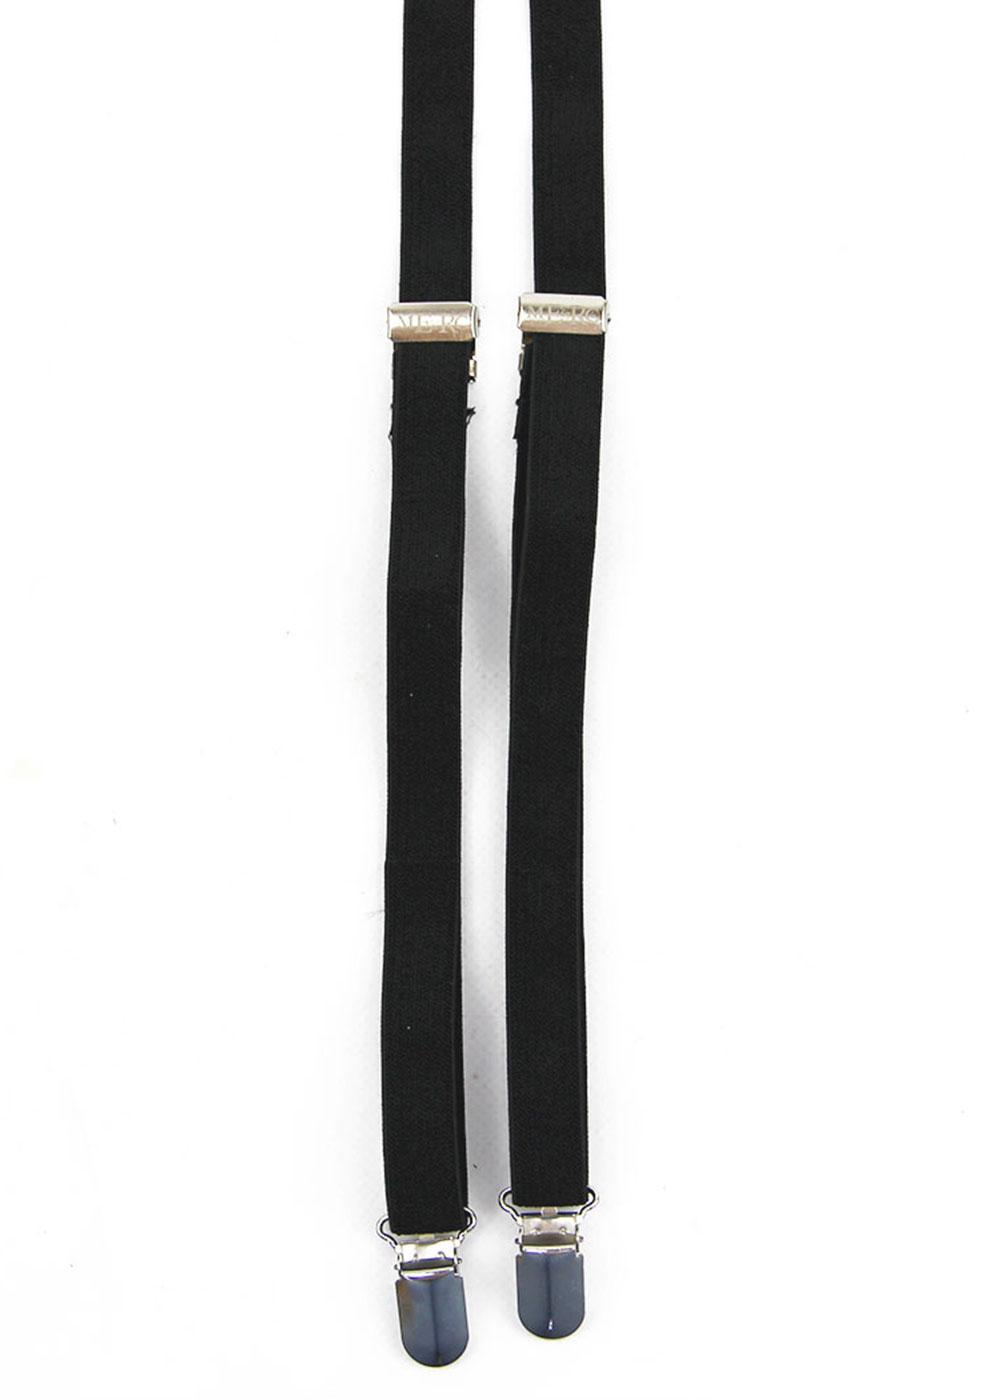 Drace MERC Retro Mod Skinny Braces (Black)